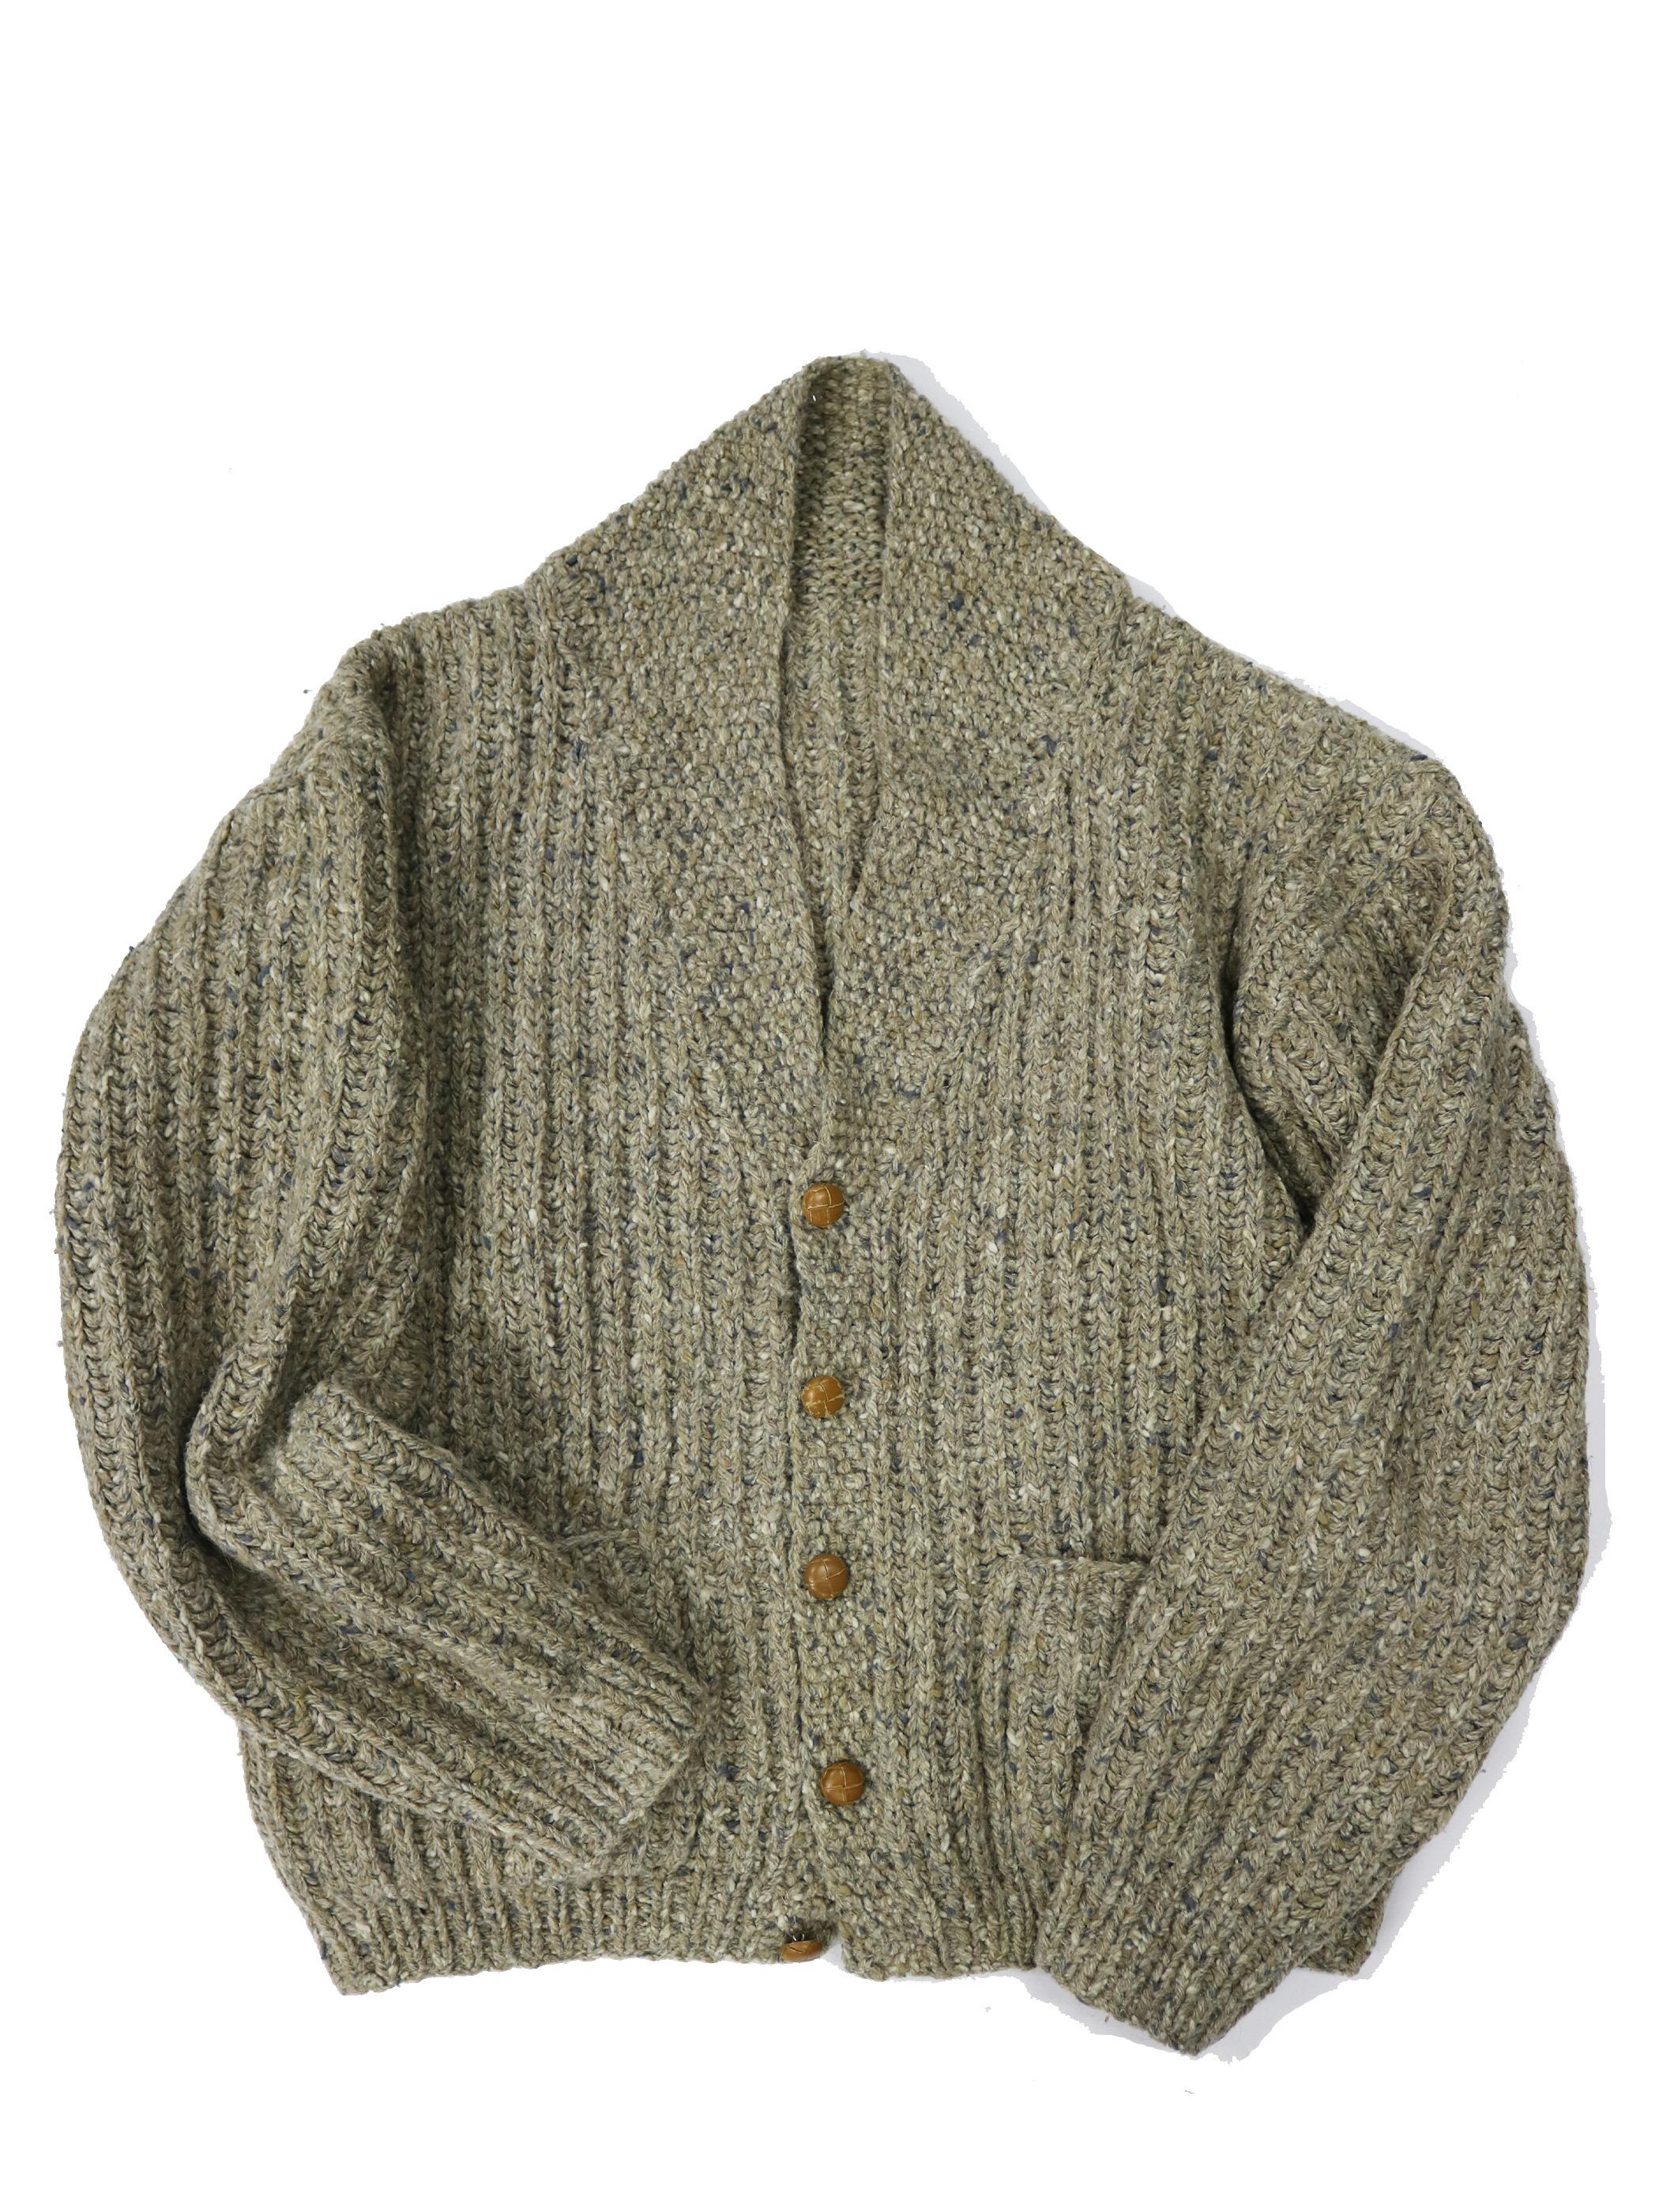 UnKnown Old Shawl collar Nep Knit Cardigan